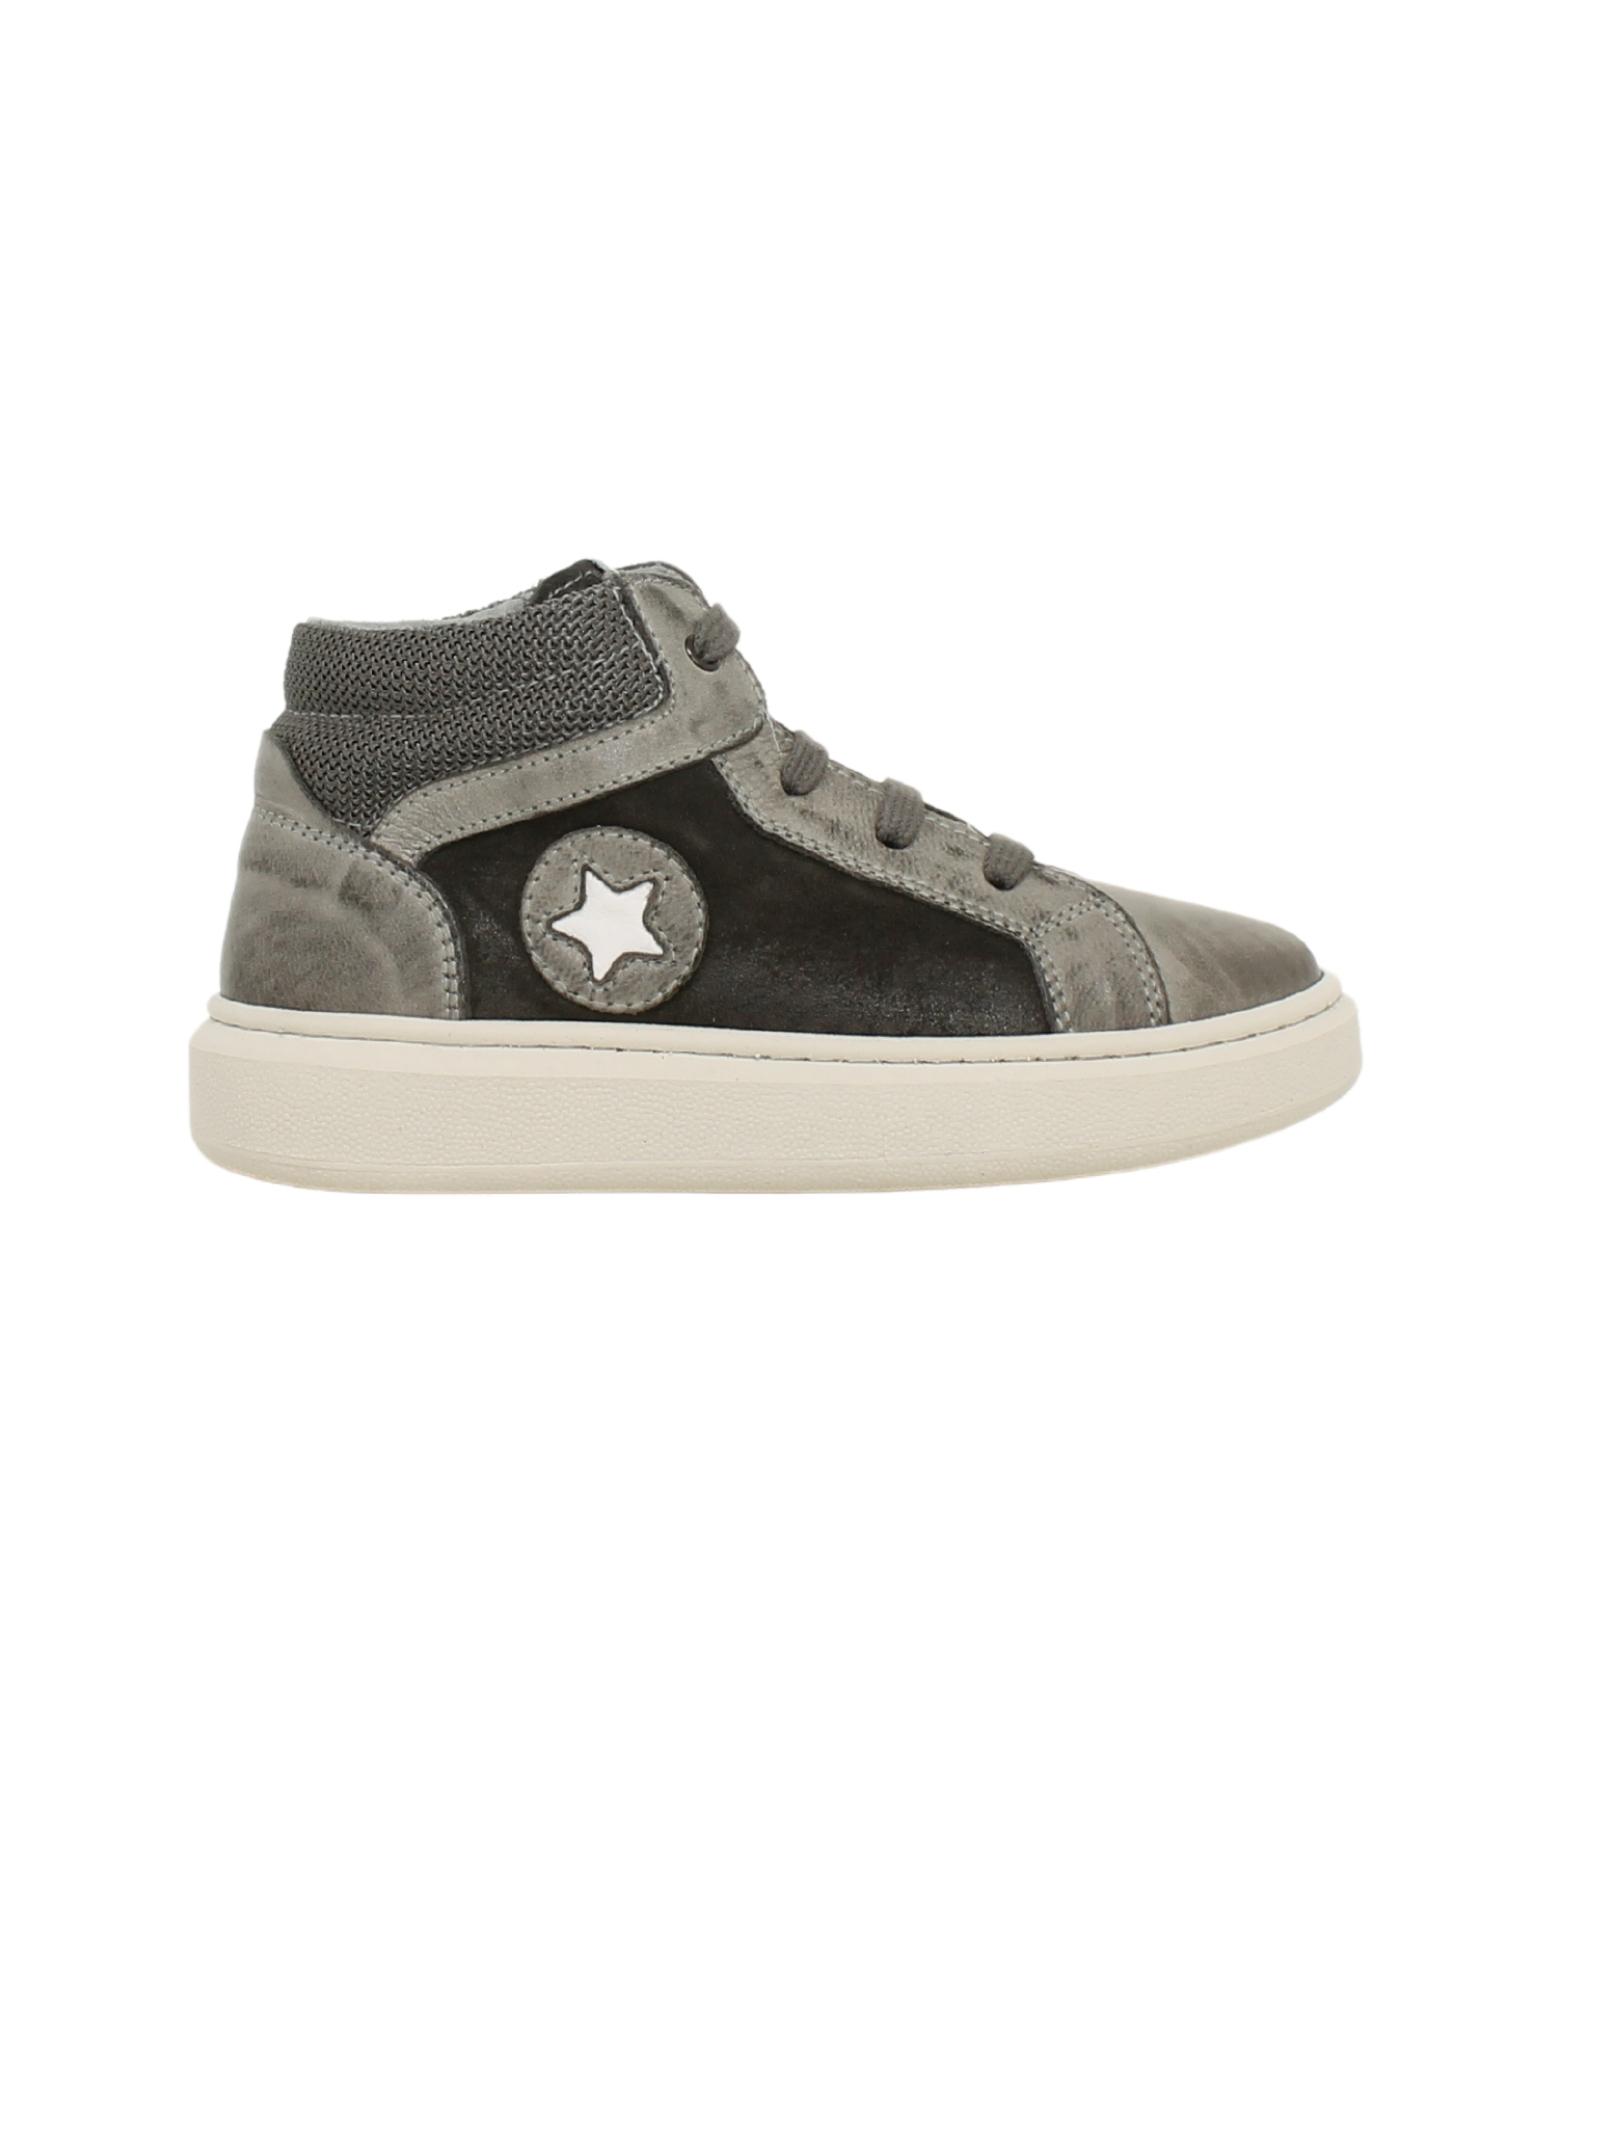 Sneakers Suede Gray Bambino NERO GIARDINI JUNIOR   Sneakers   023925M104